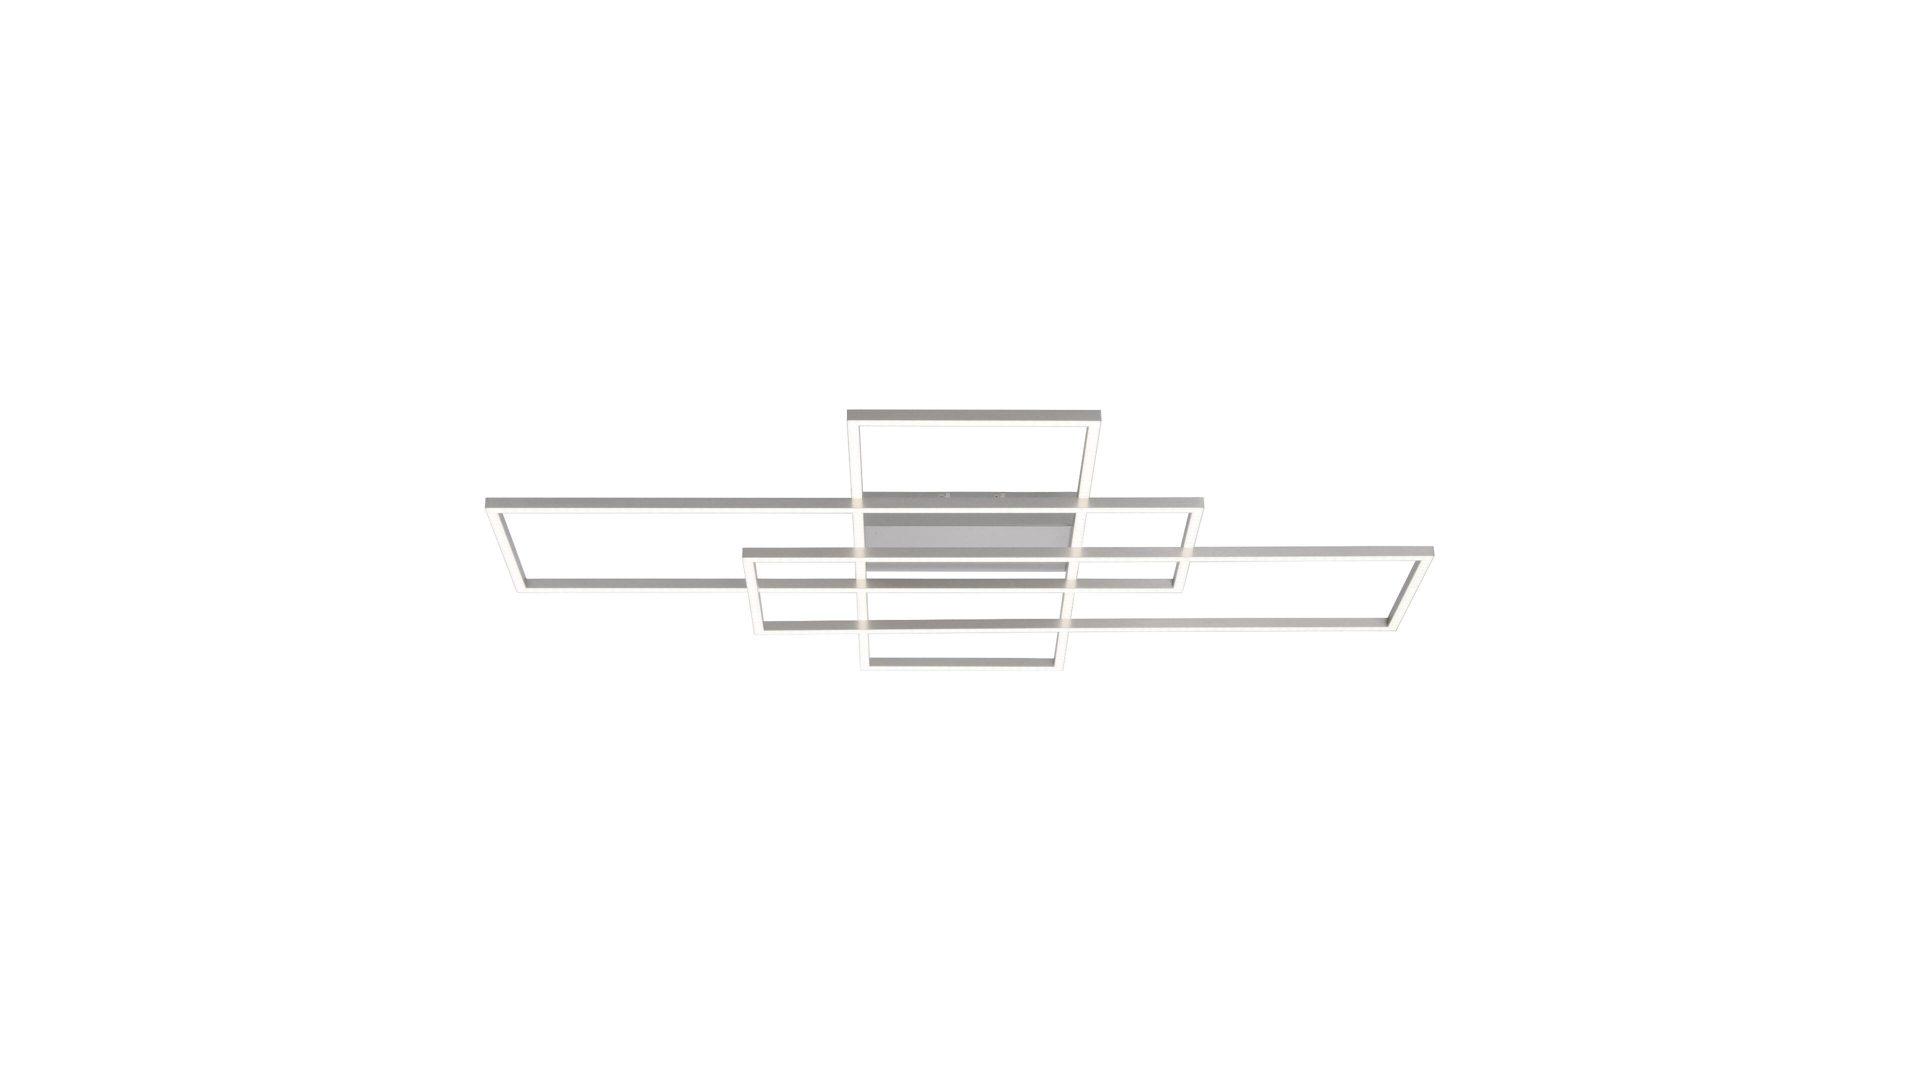 Betere Möbel Bernskötter GmbH, Räume, Flur , Lampen + Leuchten, Paul AD-84